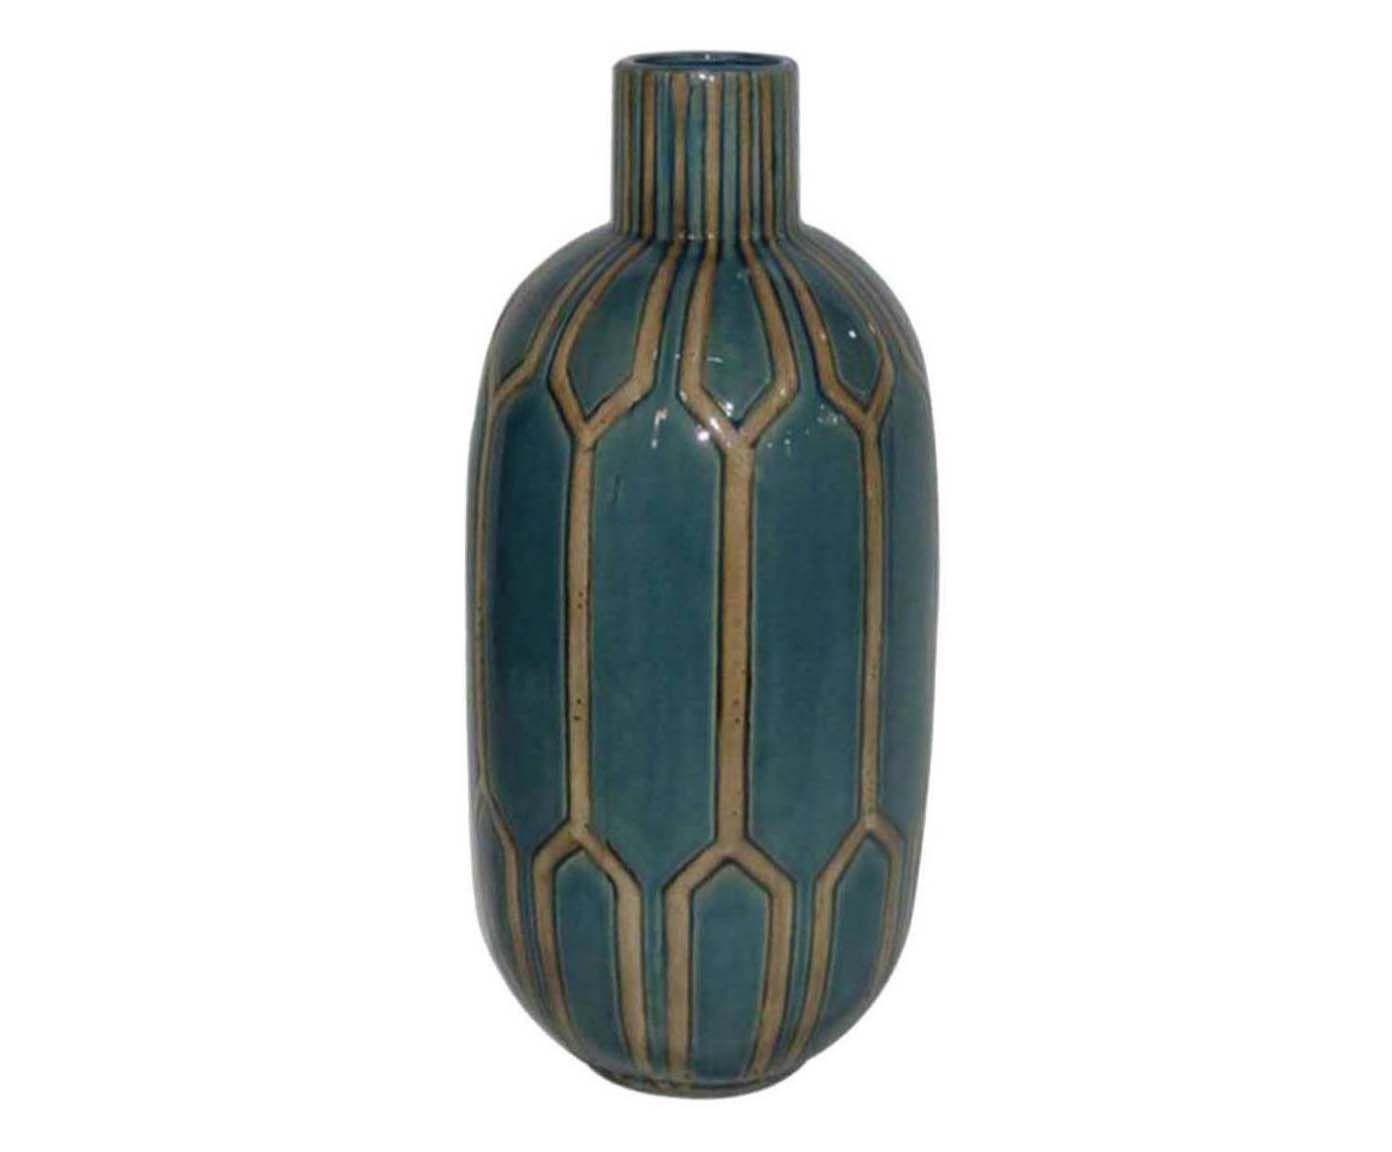 Vaso afrik - 45 x 21 cm   Westwing.com.br